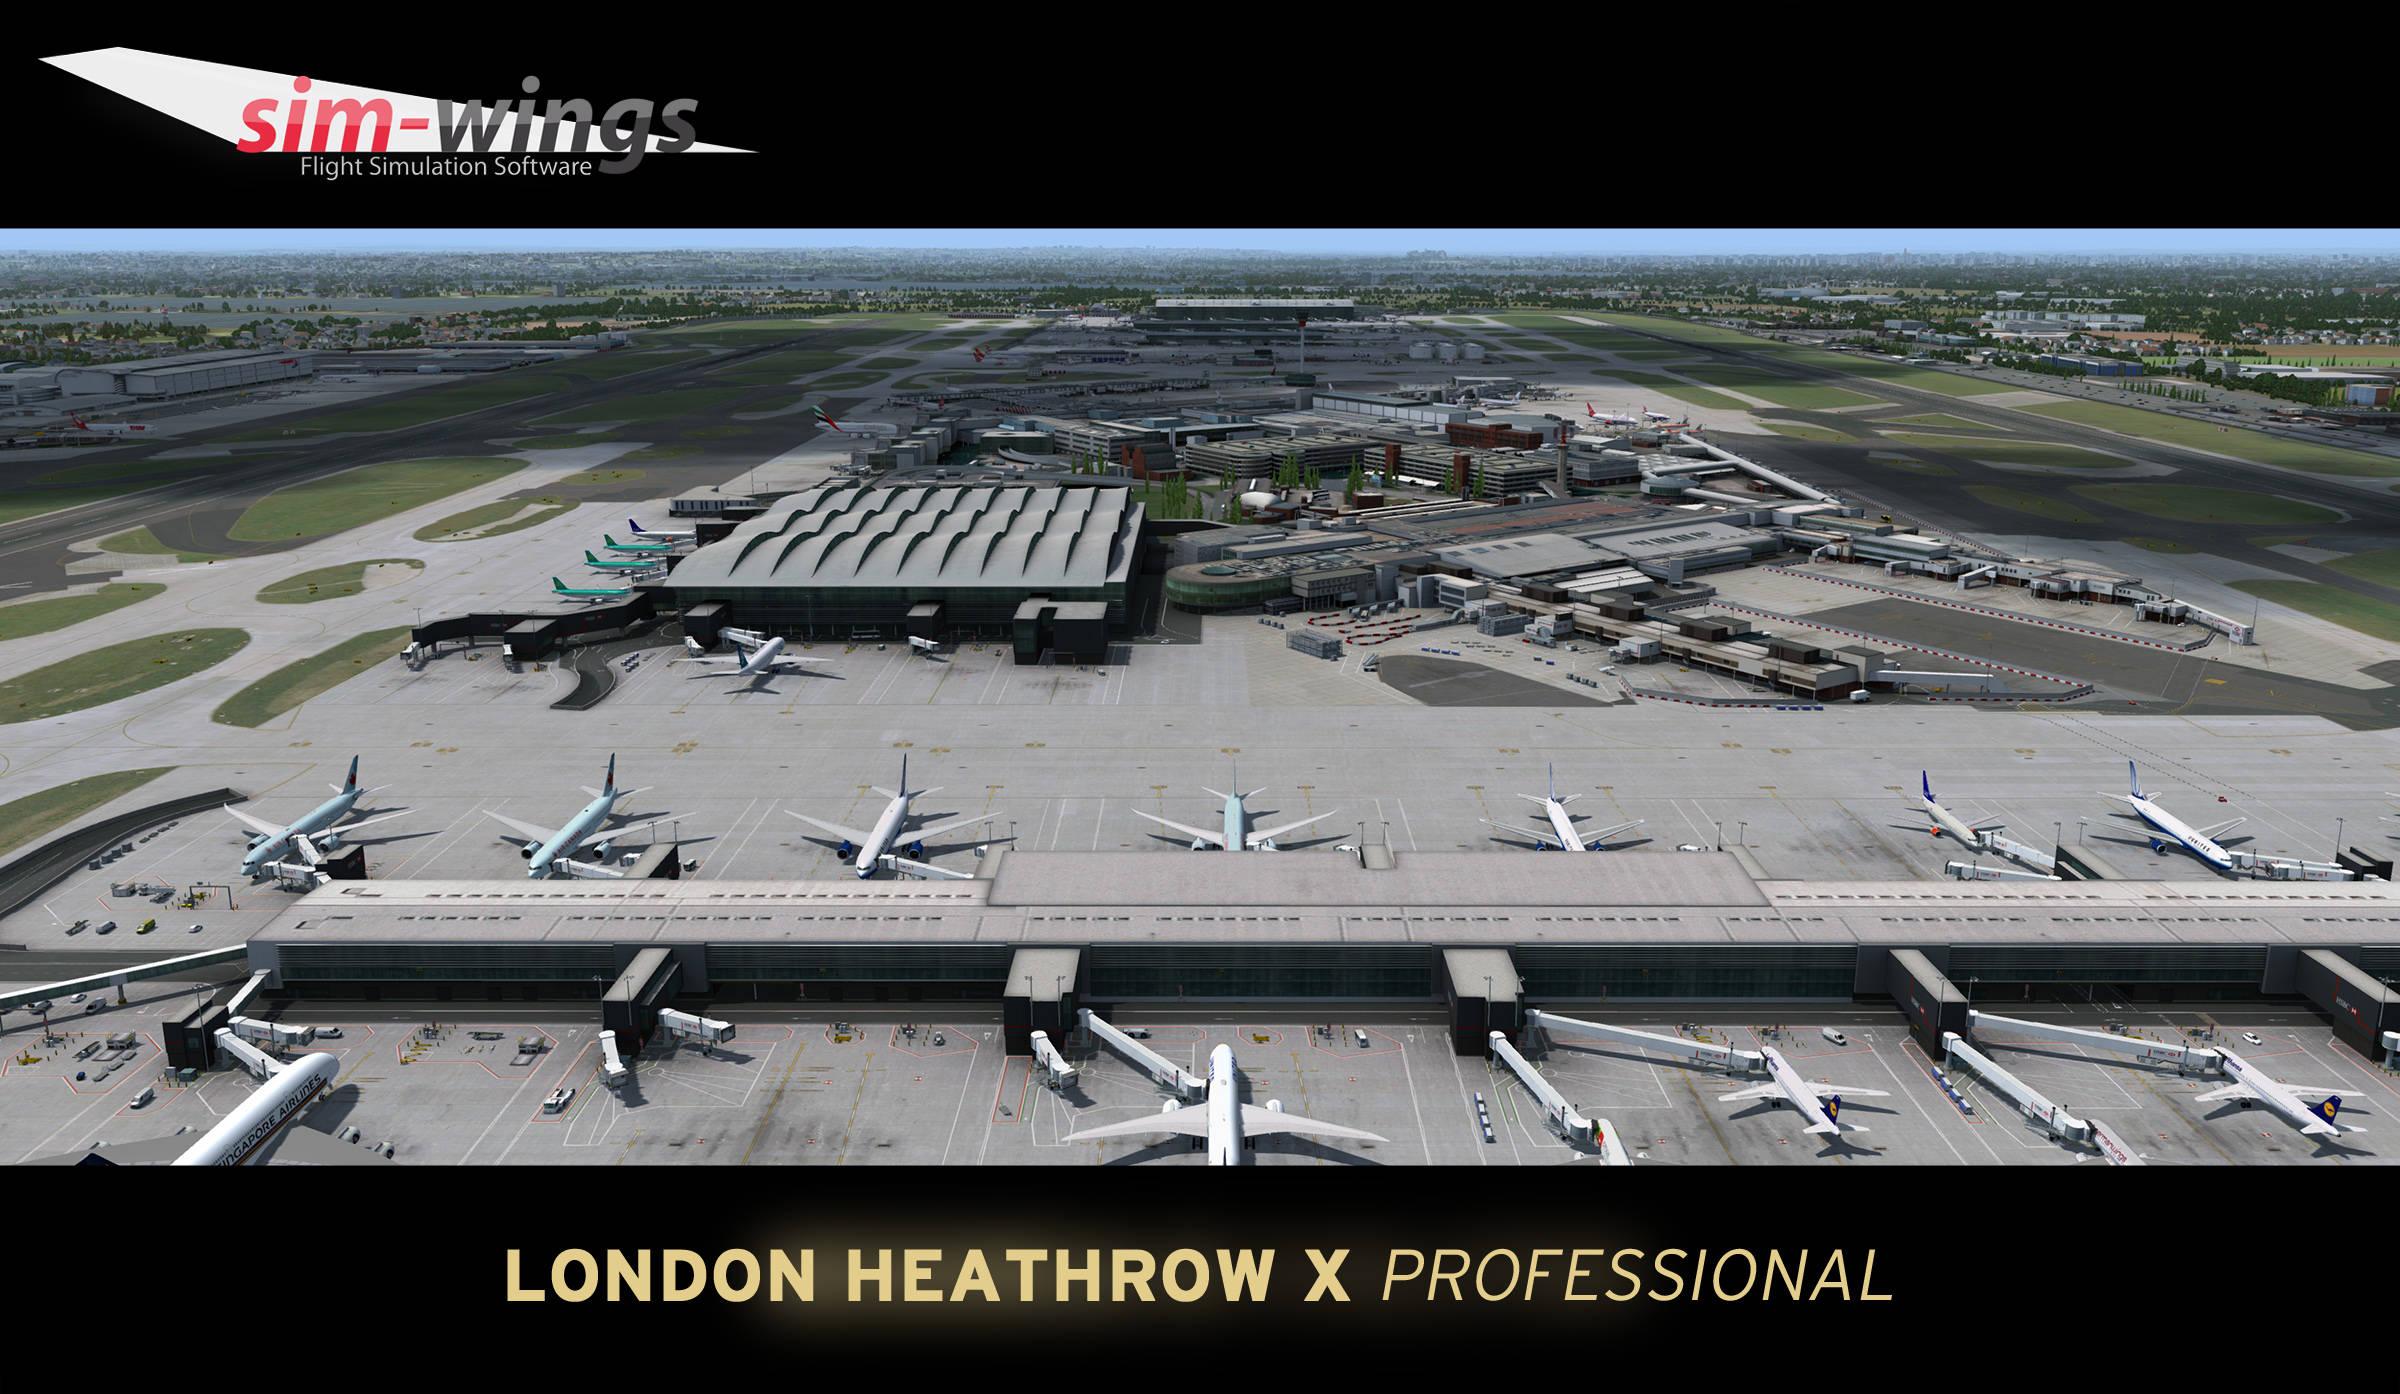 https://dxhb0it26is40.cloudfront.net/productimages/mega-airport-london-heathrow-professional_7_ss_l_171002125833.jpg